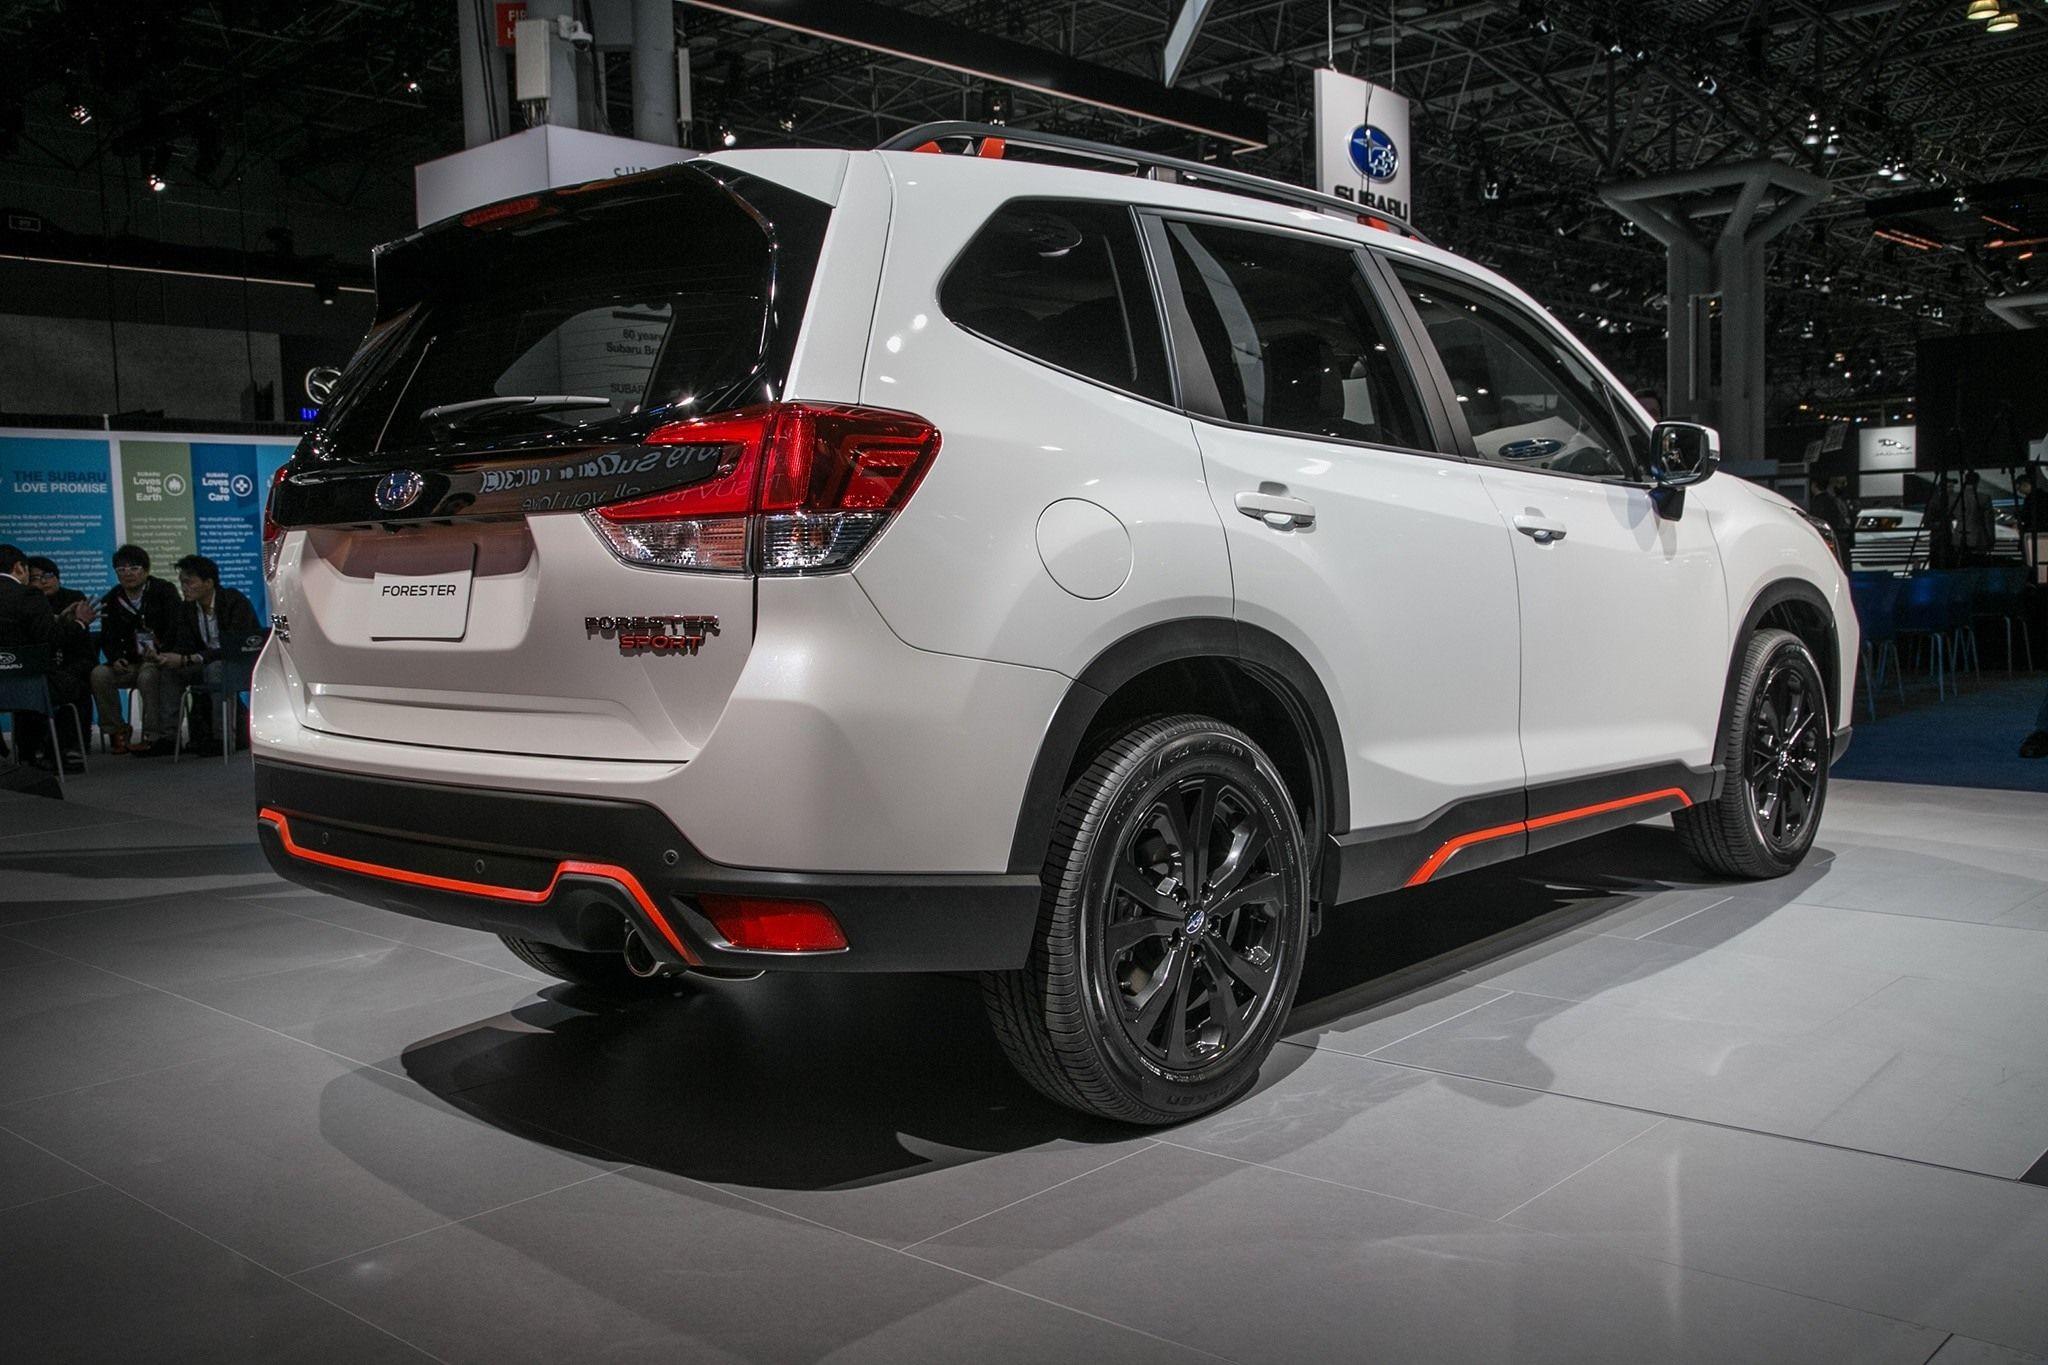 2019 Subaru Sports First Drive Subaru forester, Subaru